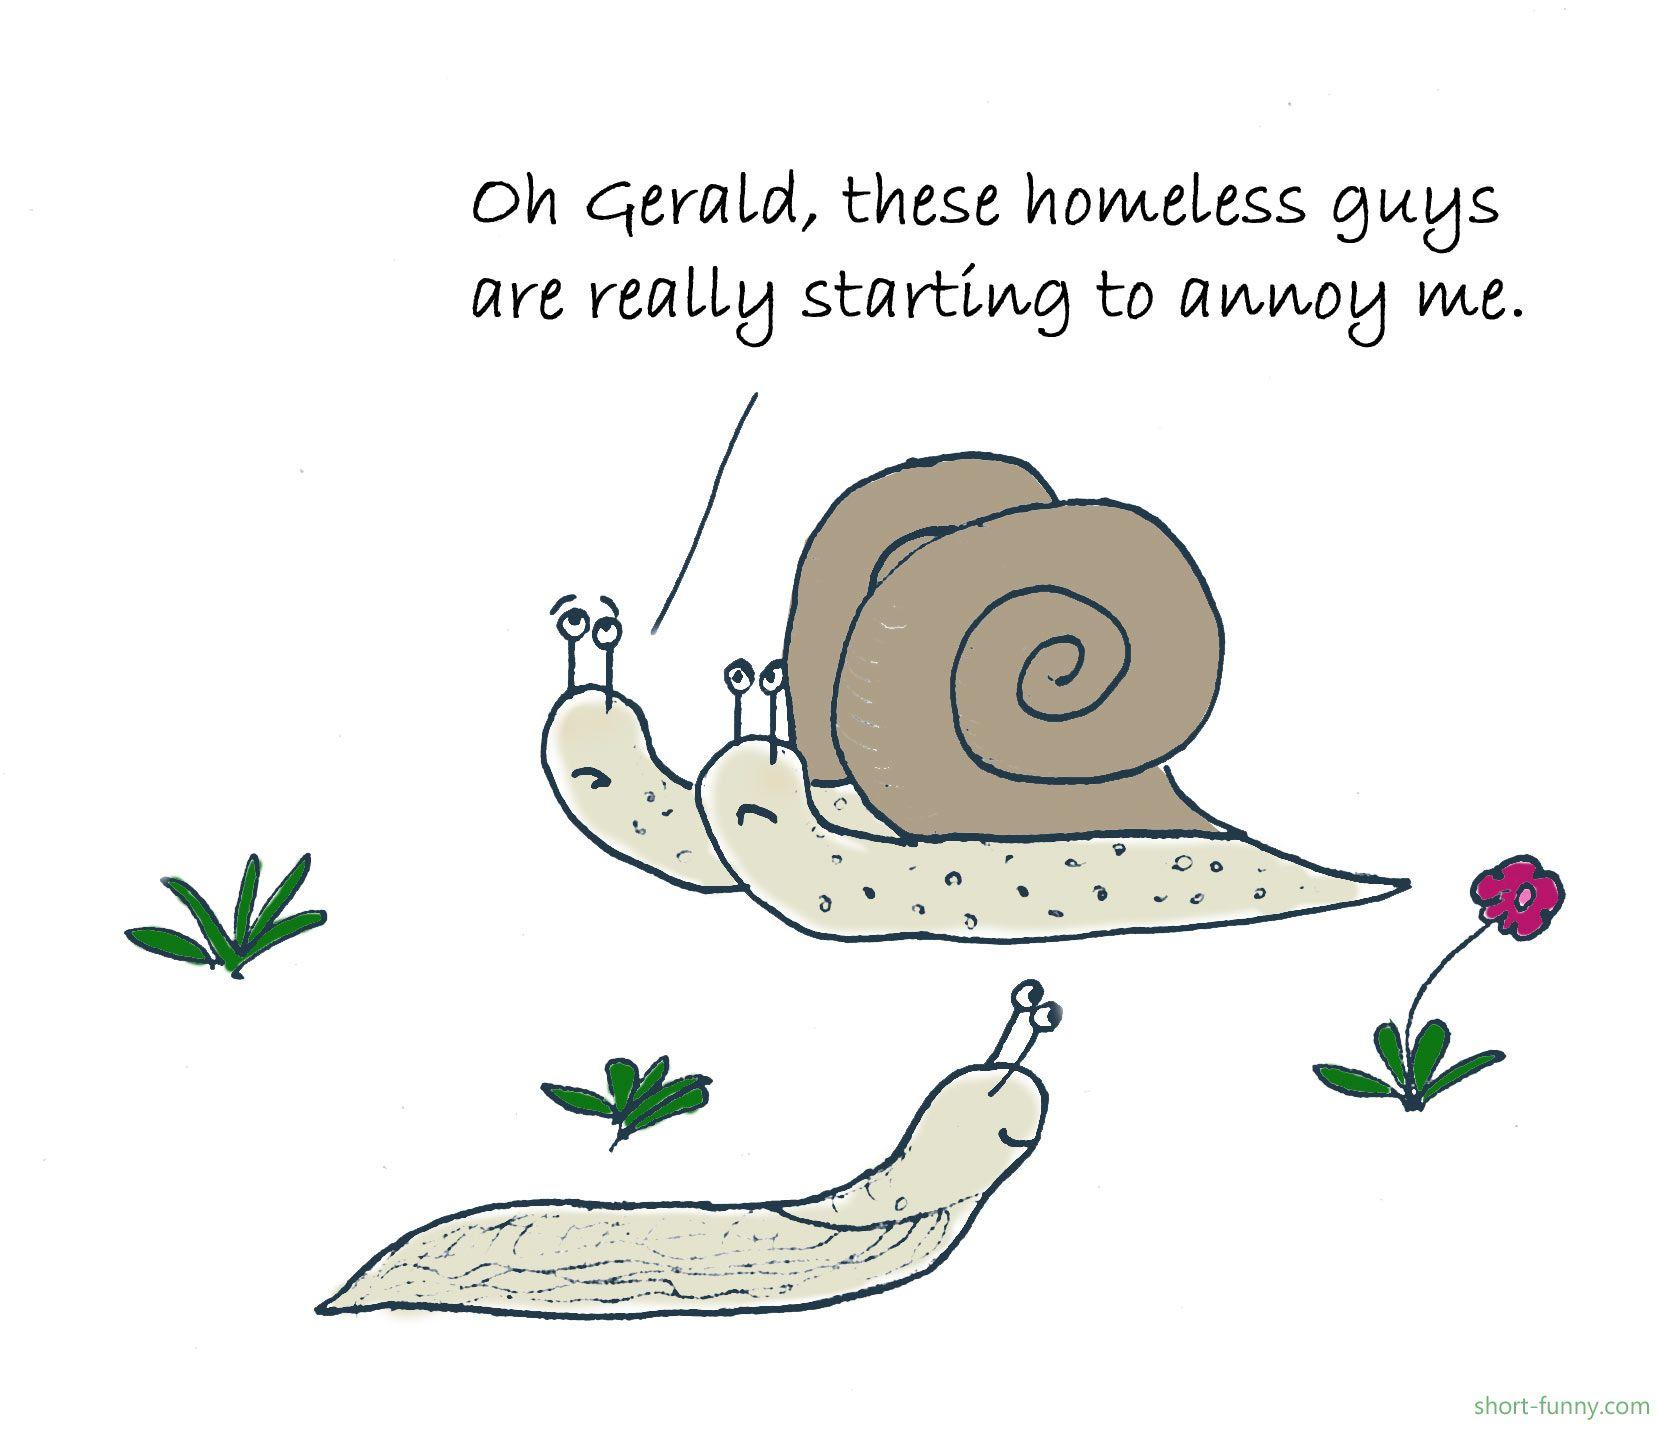 Funny Joke Cartoon From Short Funny Com Snail Joke Humor For Kids Jokes For Kids Funny Jokes Jokes